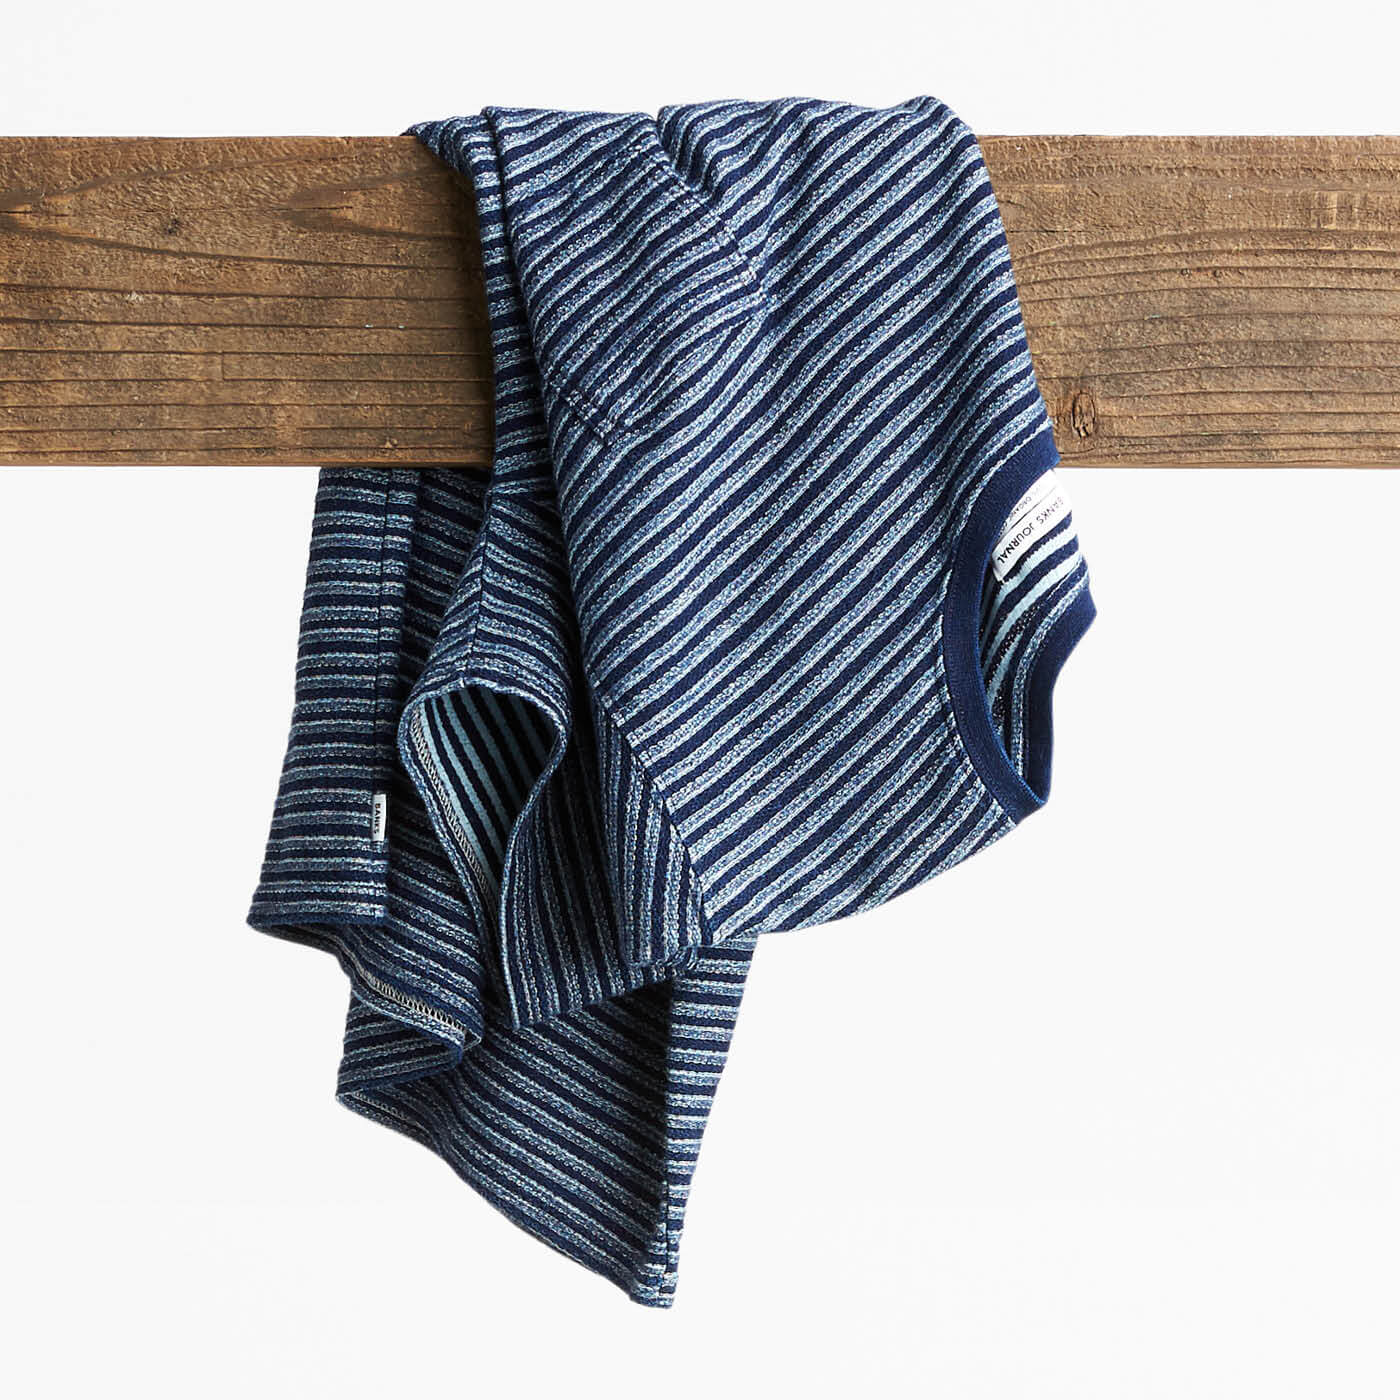 f7abfccbf4c83 5 Ways to Wear a T-Shirt | Stitch Fix Men